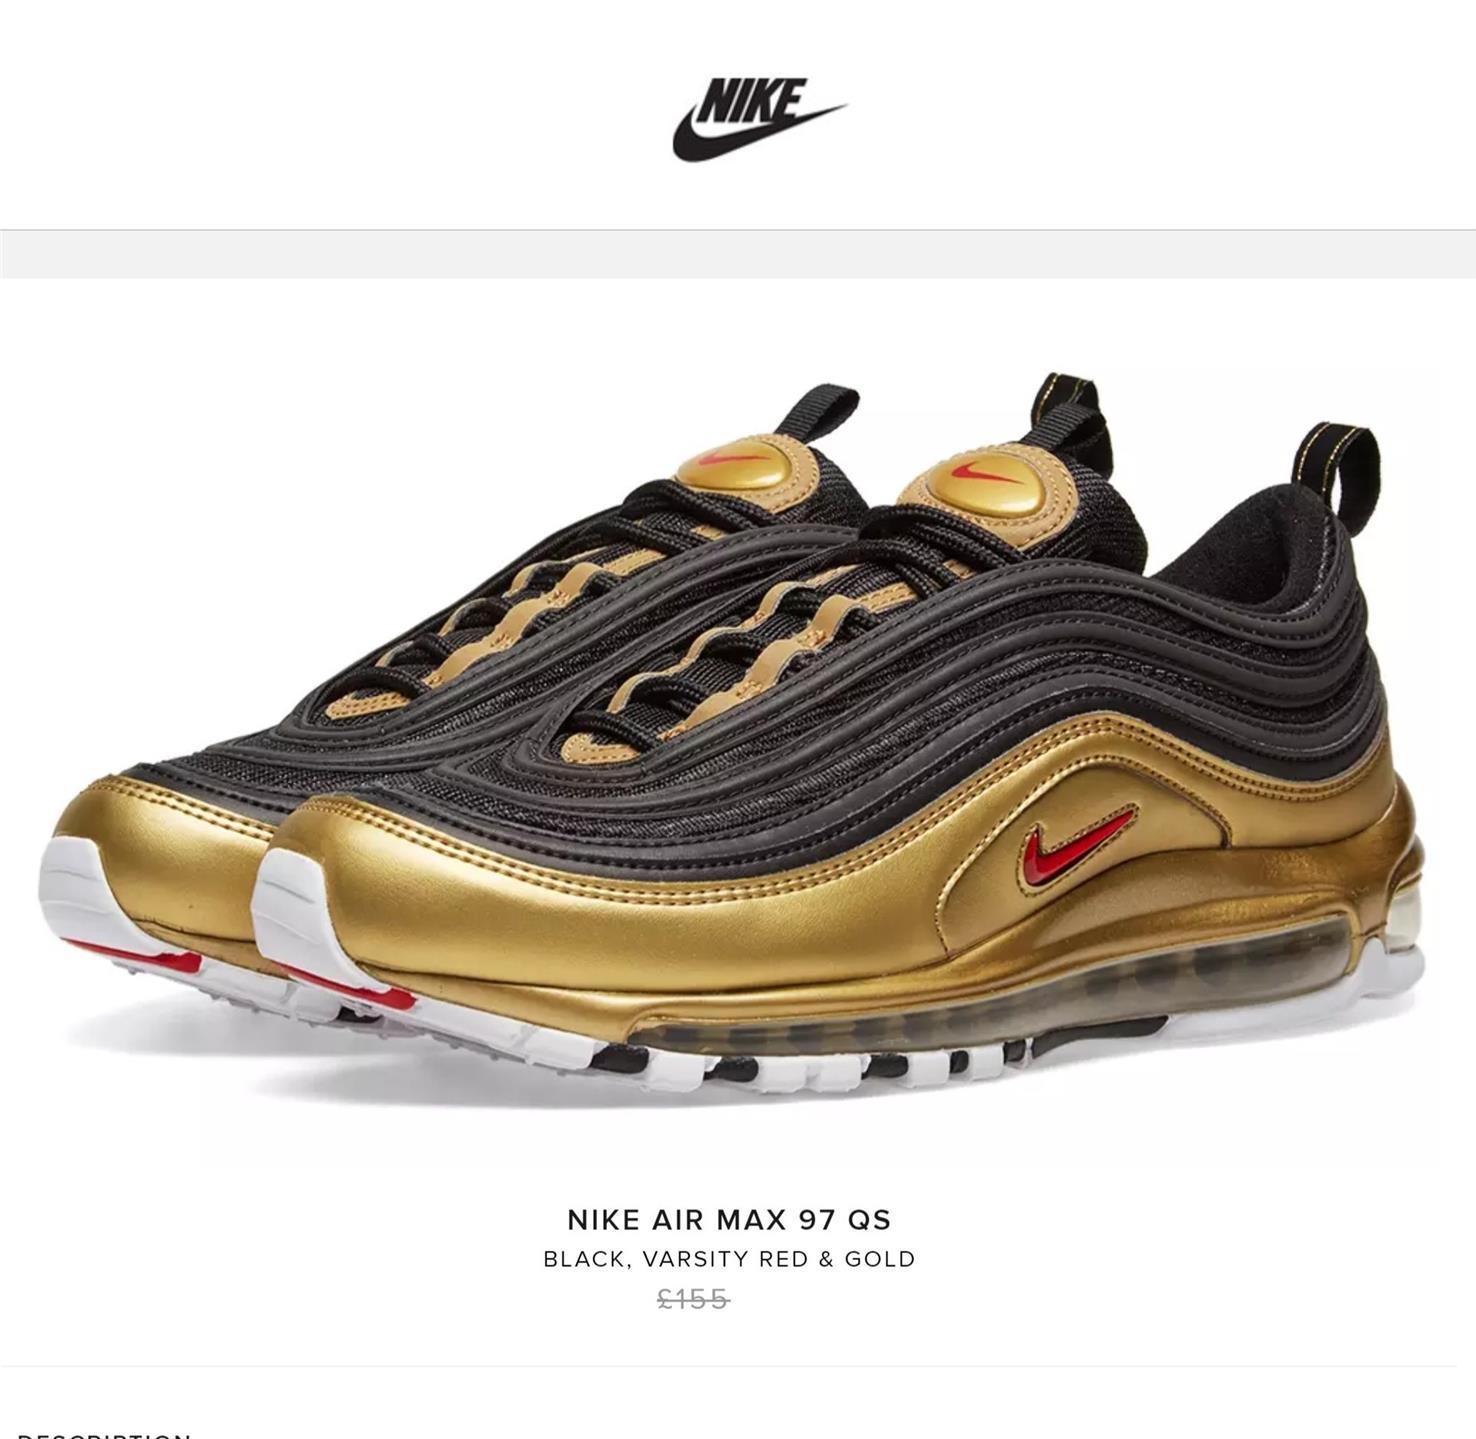 Nike | AIR MAX 97 QS | Nero, Varsity Rosso e Oro | AT5458